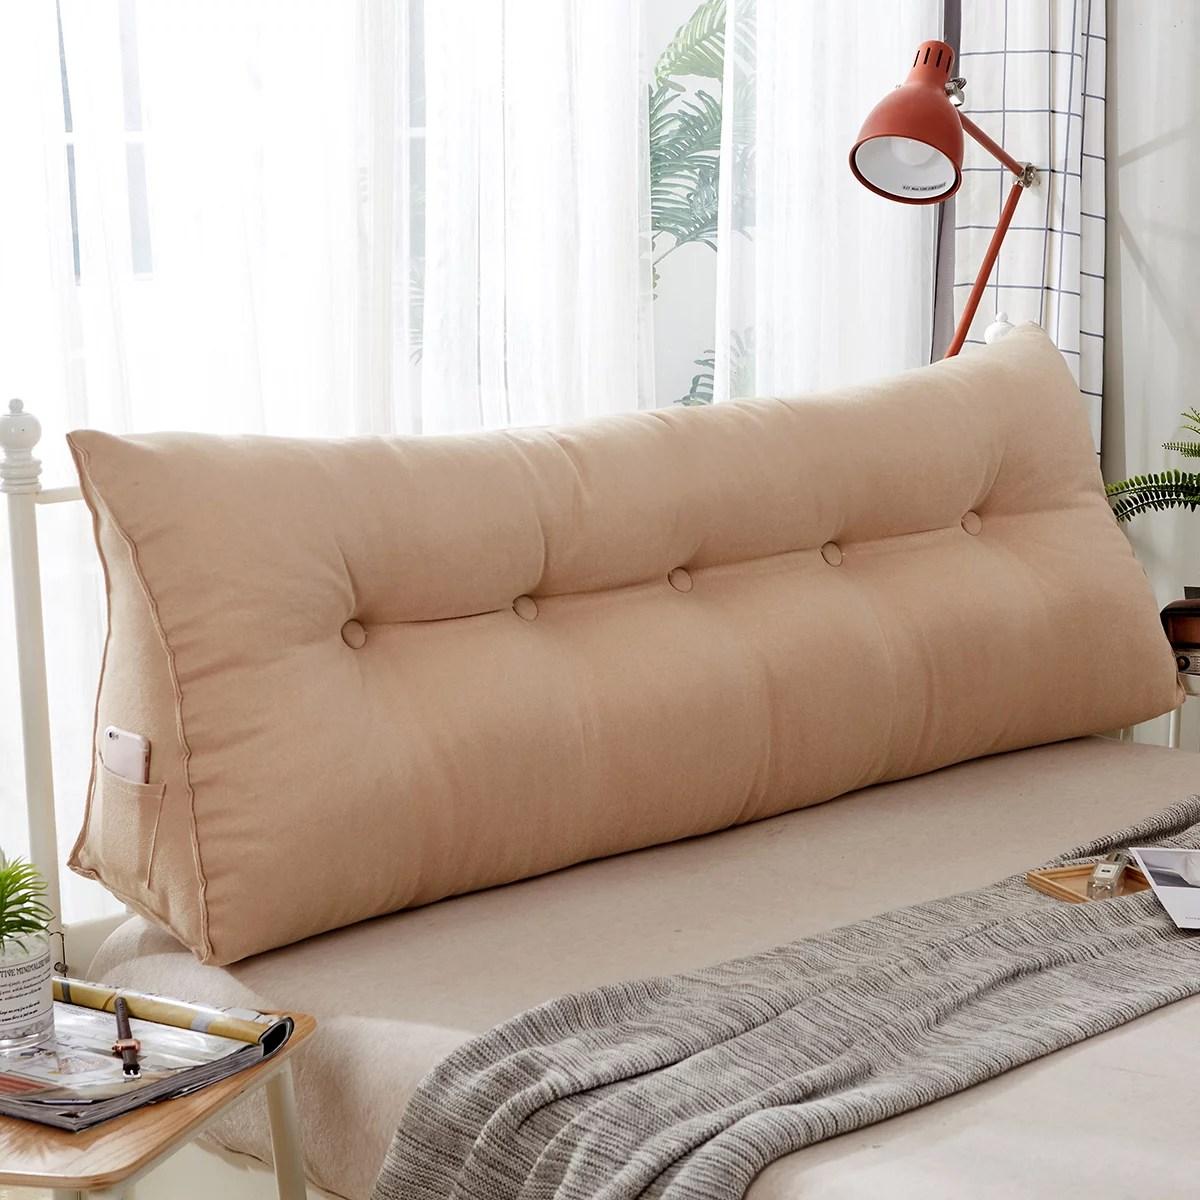 Multi Color Wedge Triangular Pillow Cushion Bedside Pillow Bed Backrest Positioning Support Pillow Reading Pillow Office Lumbar Pad Soft Adjustable Walmart Com Walmart Com